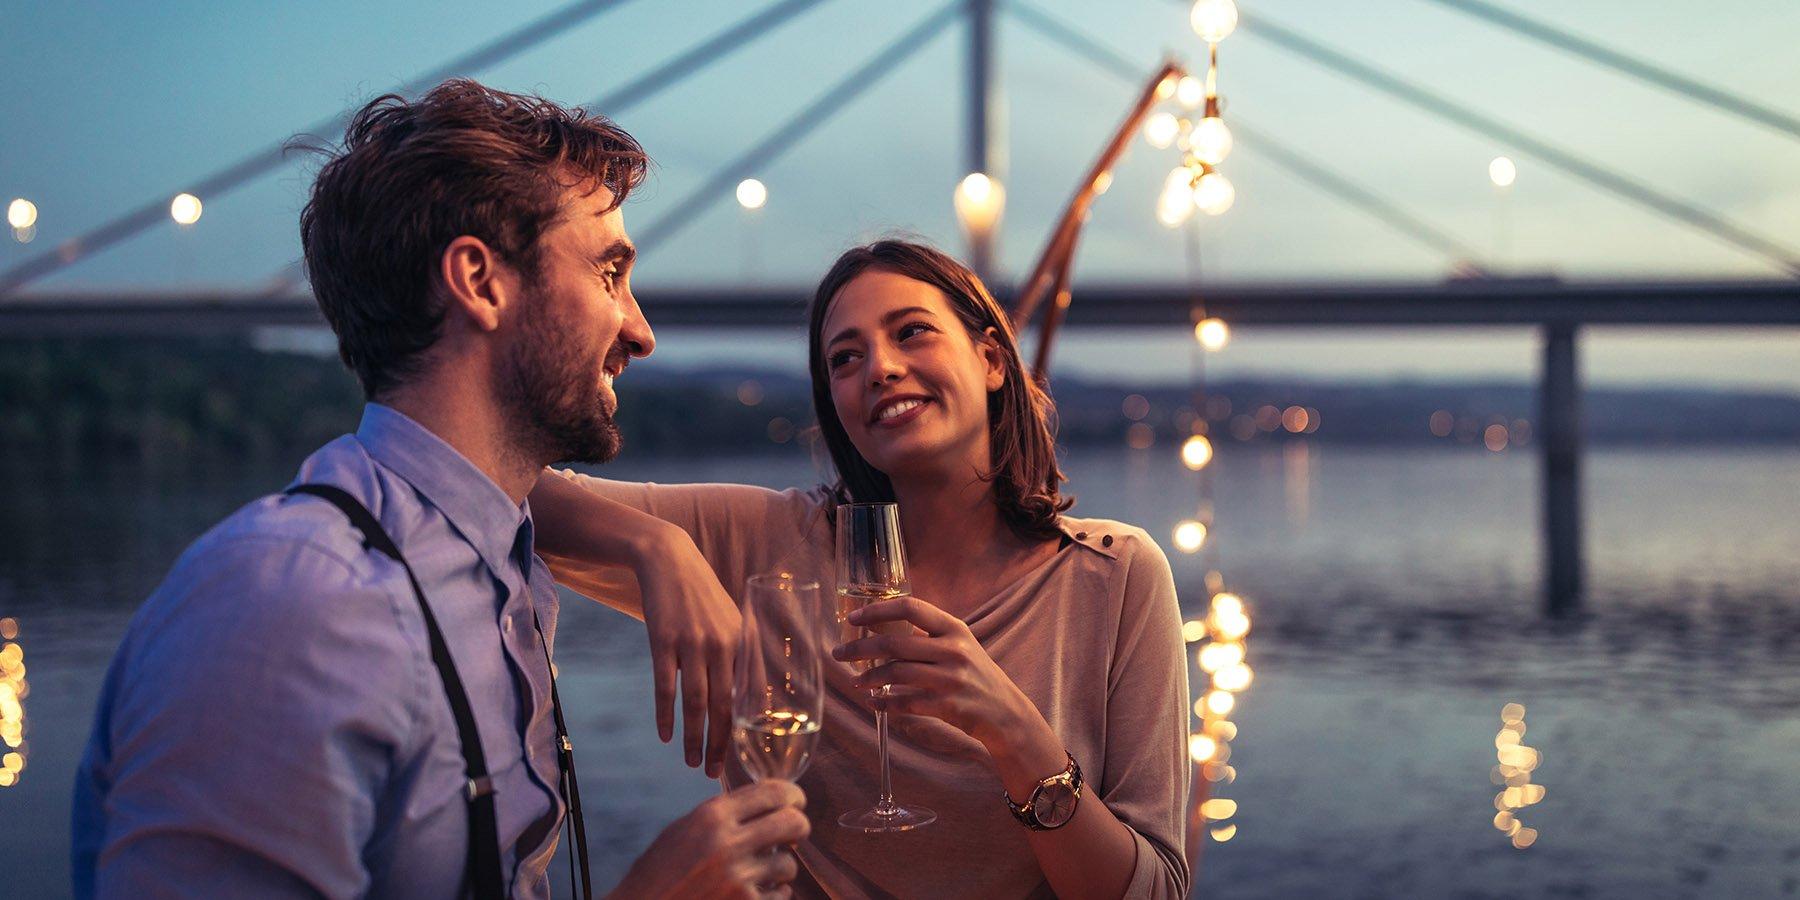 All about Bubbles, Schaumwein Tasting, Restaurant & Bar Tschadun, Kloten, Hotel Allegra Lodge, welcome hotels